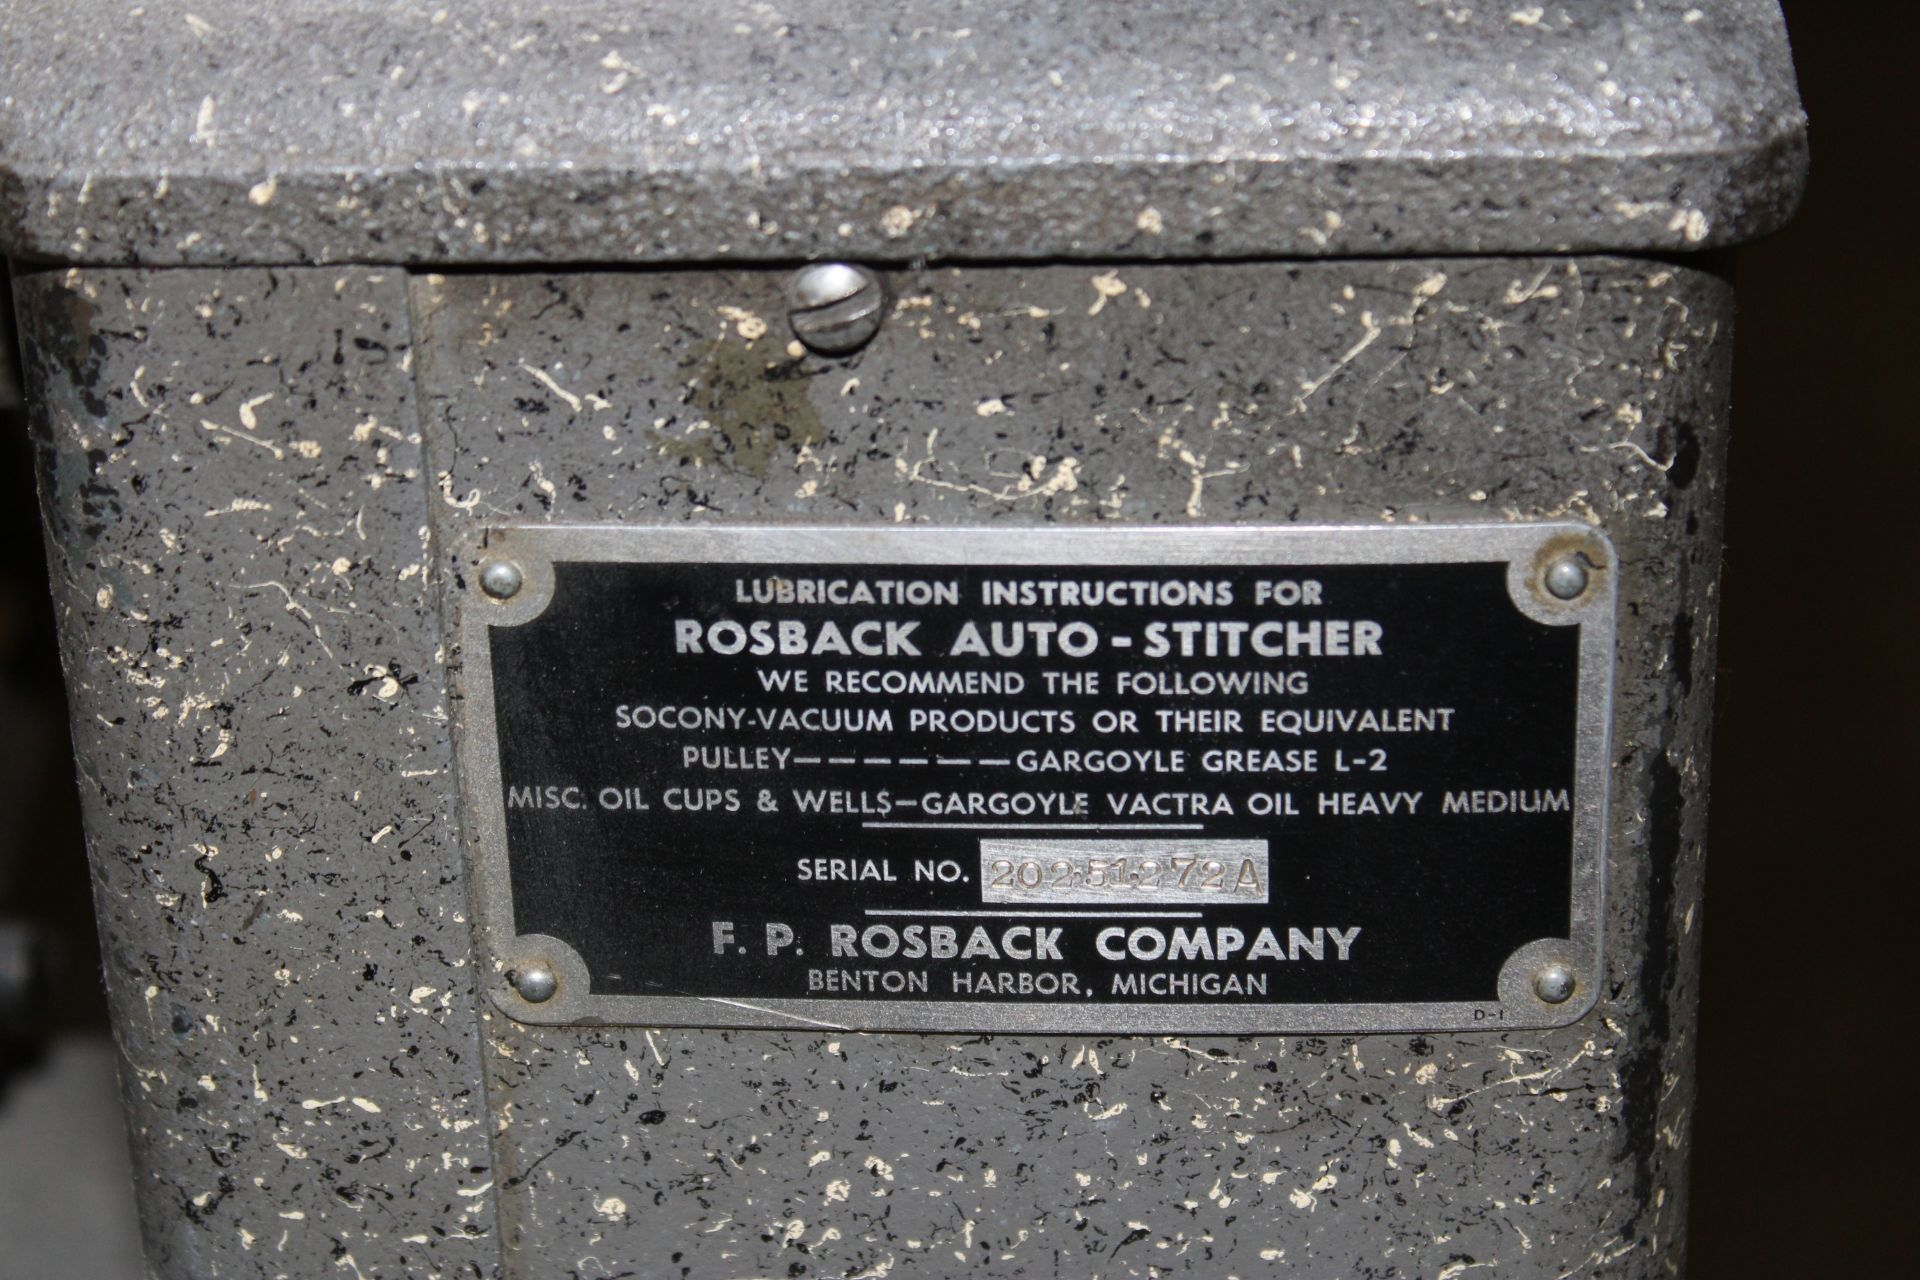 Lot 43 - Rosback Auto Dash Stitcher s/n 20251272A